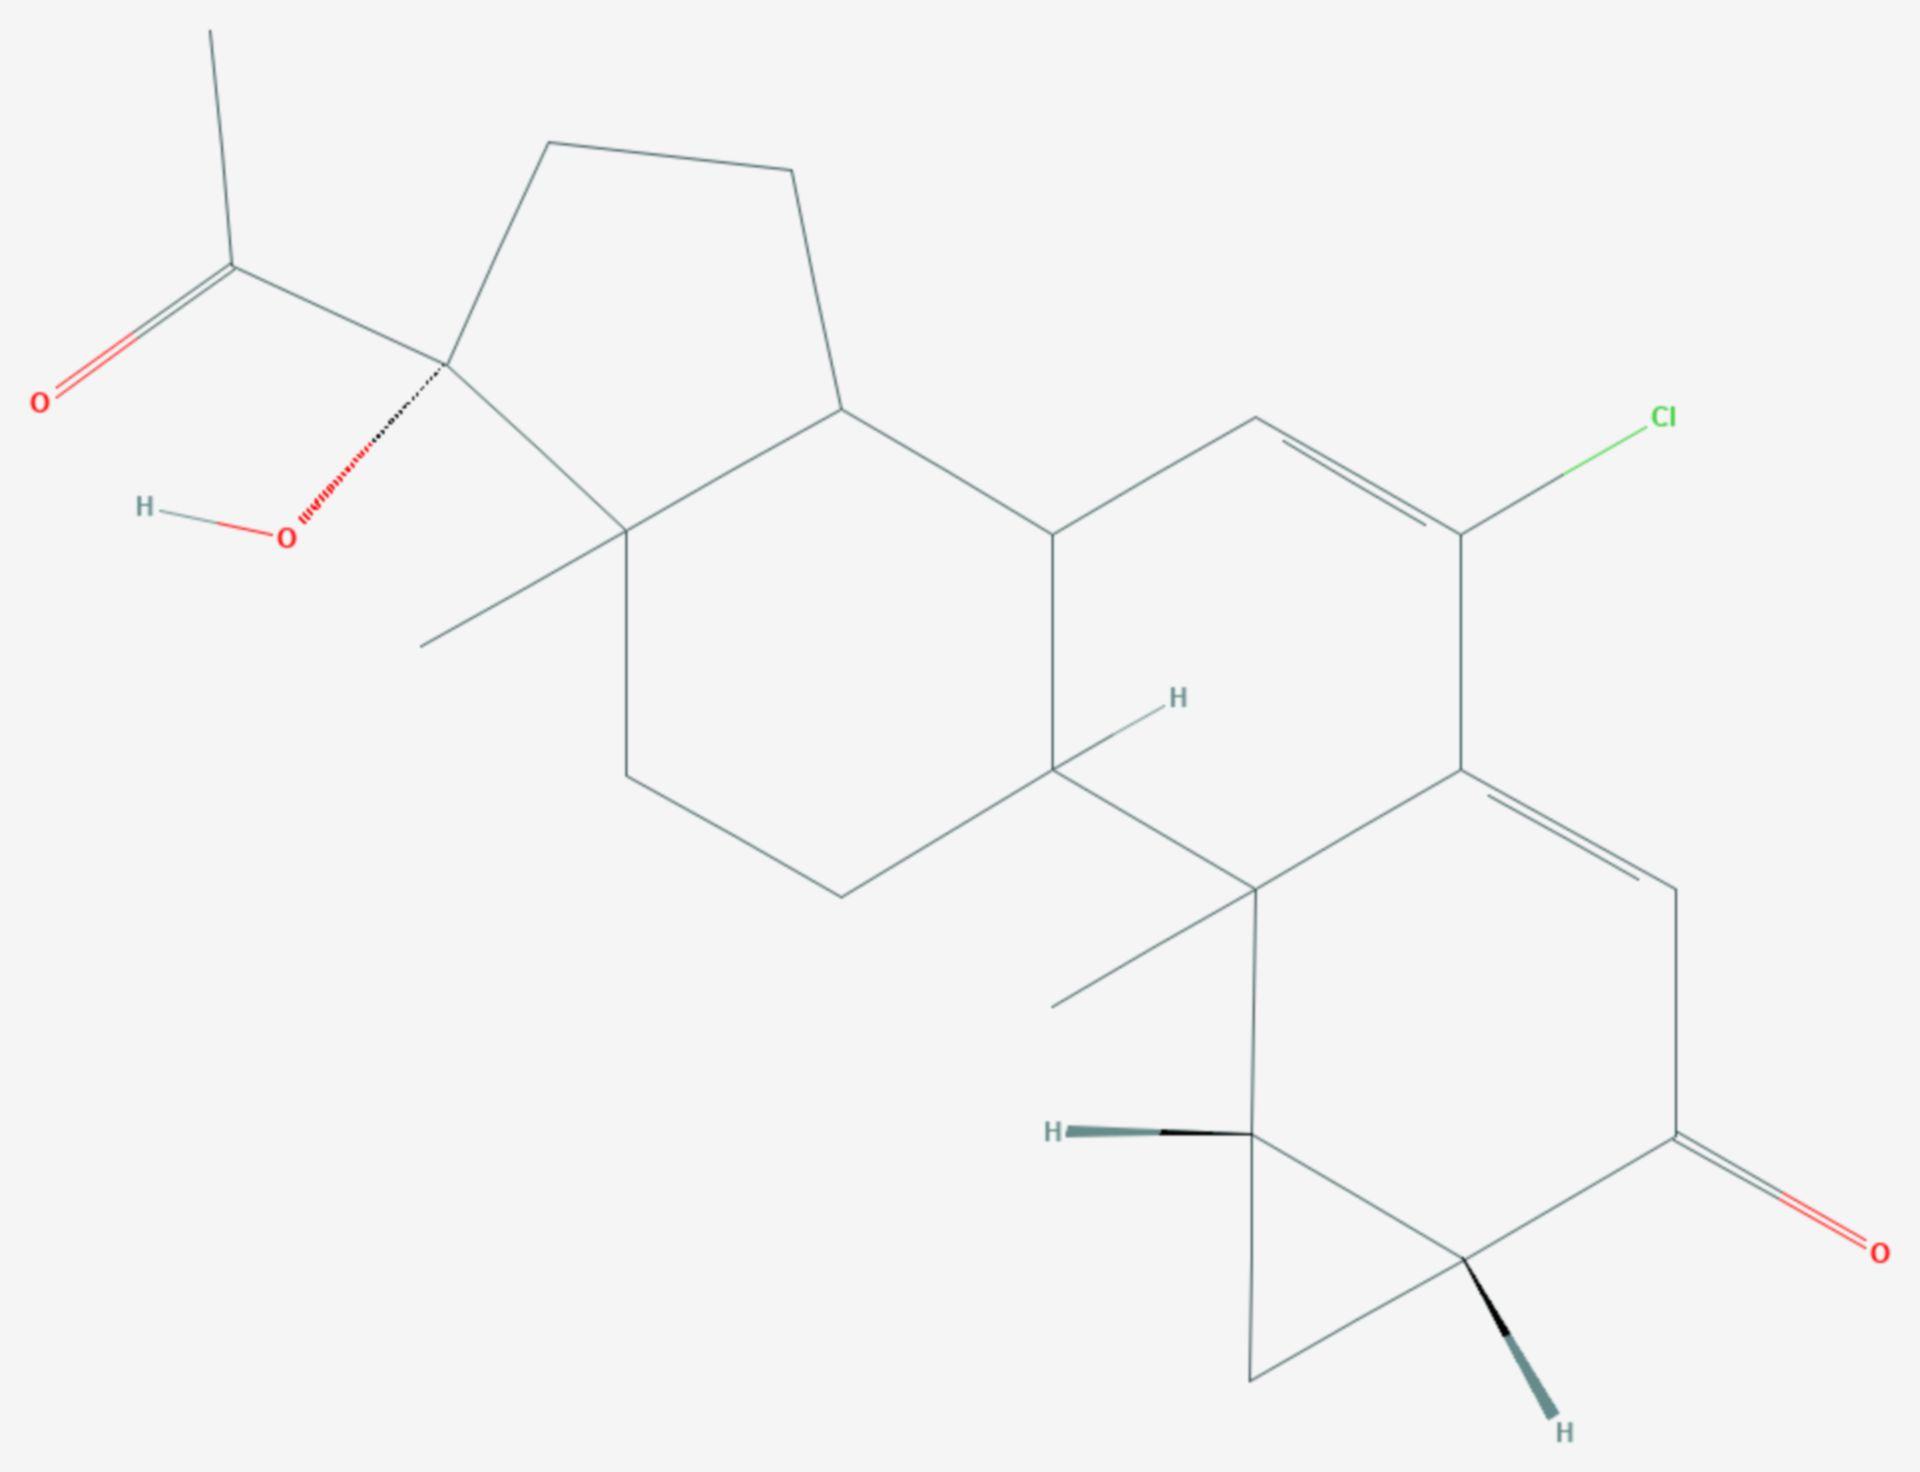 Cyproteron (Strukturformel)